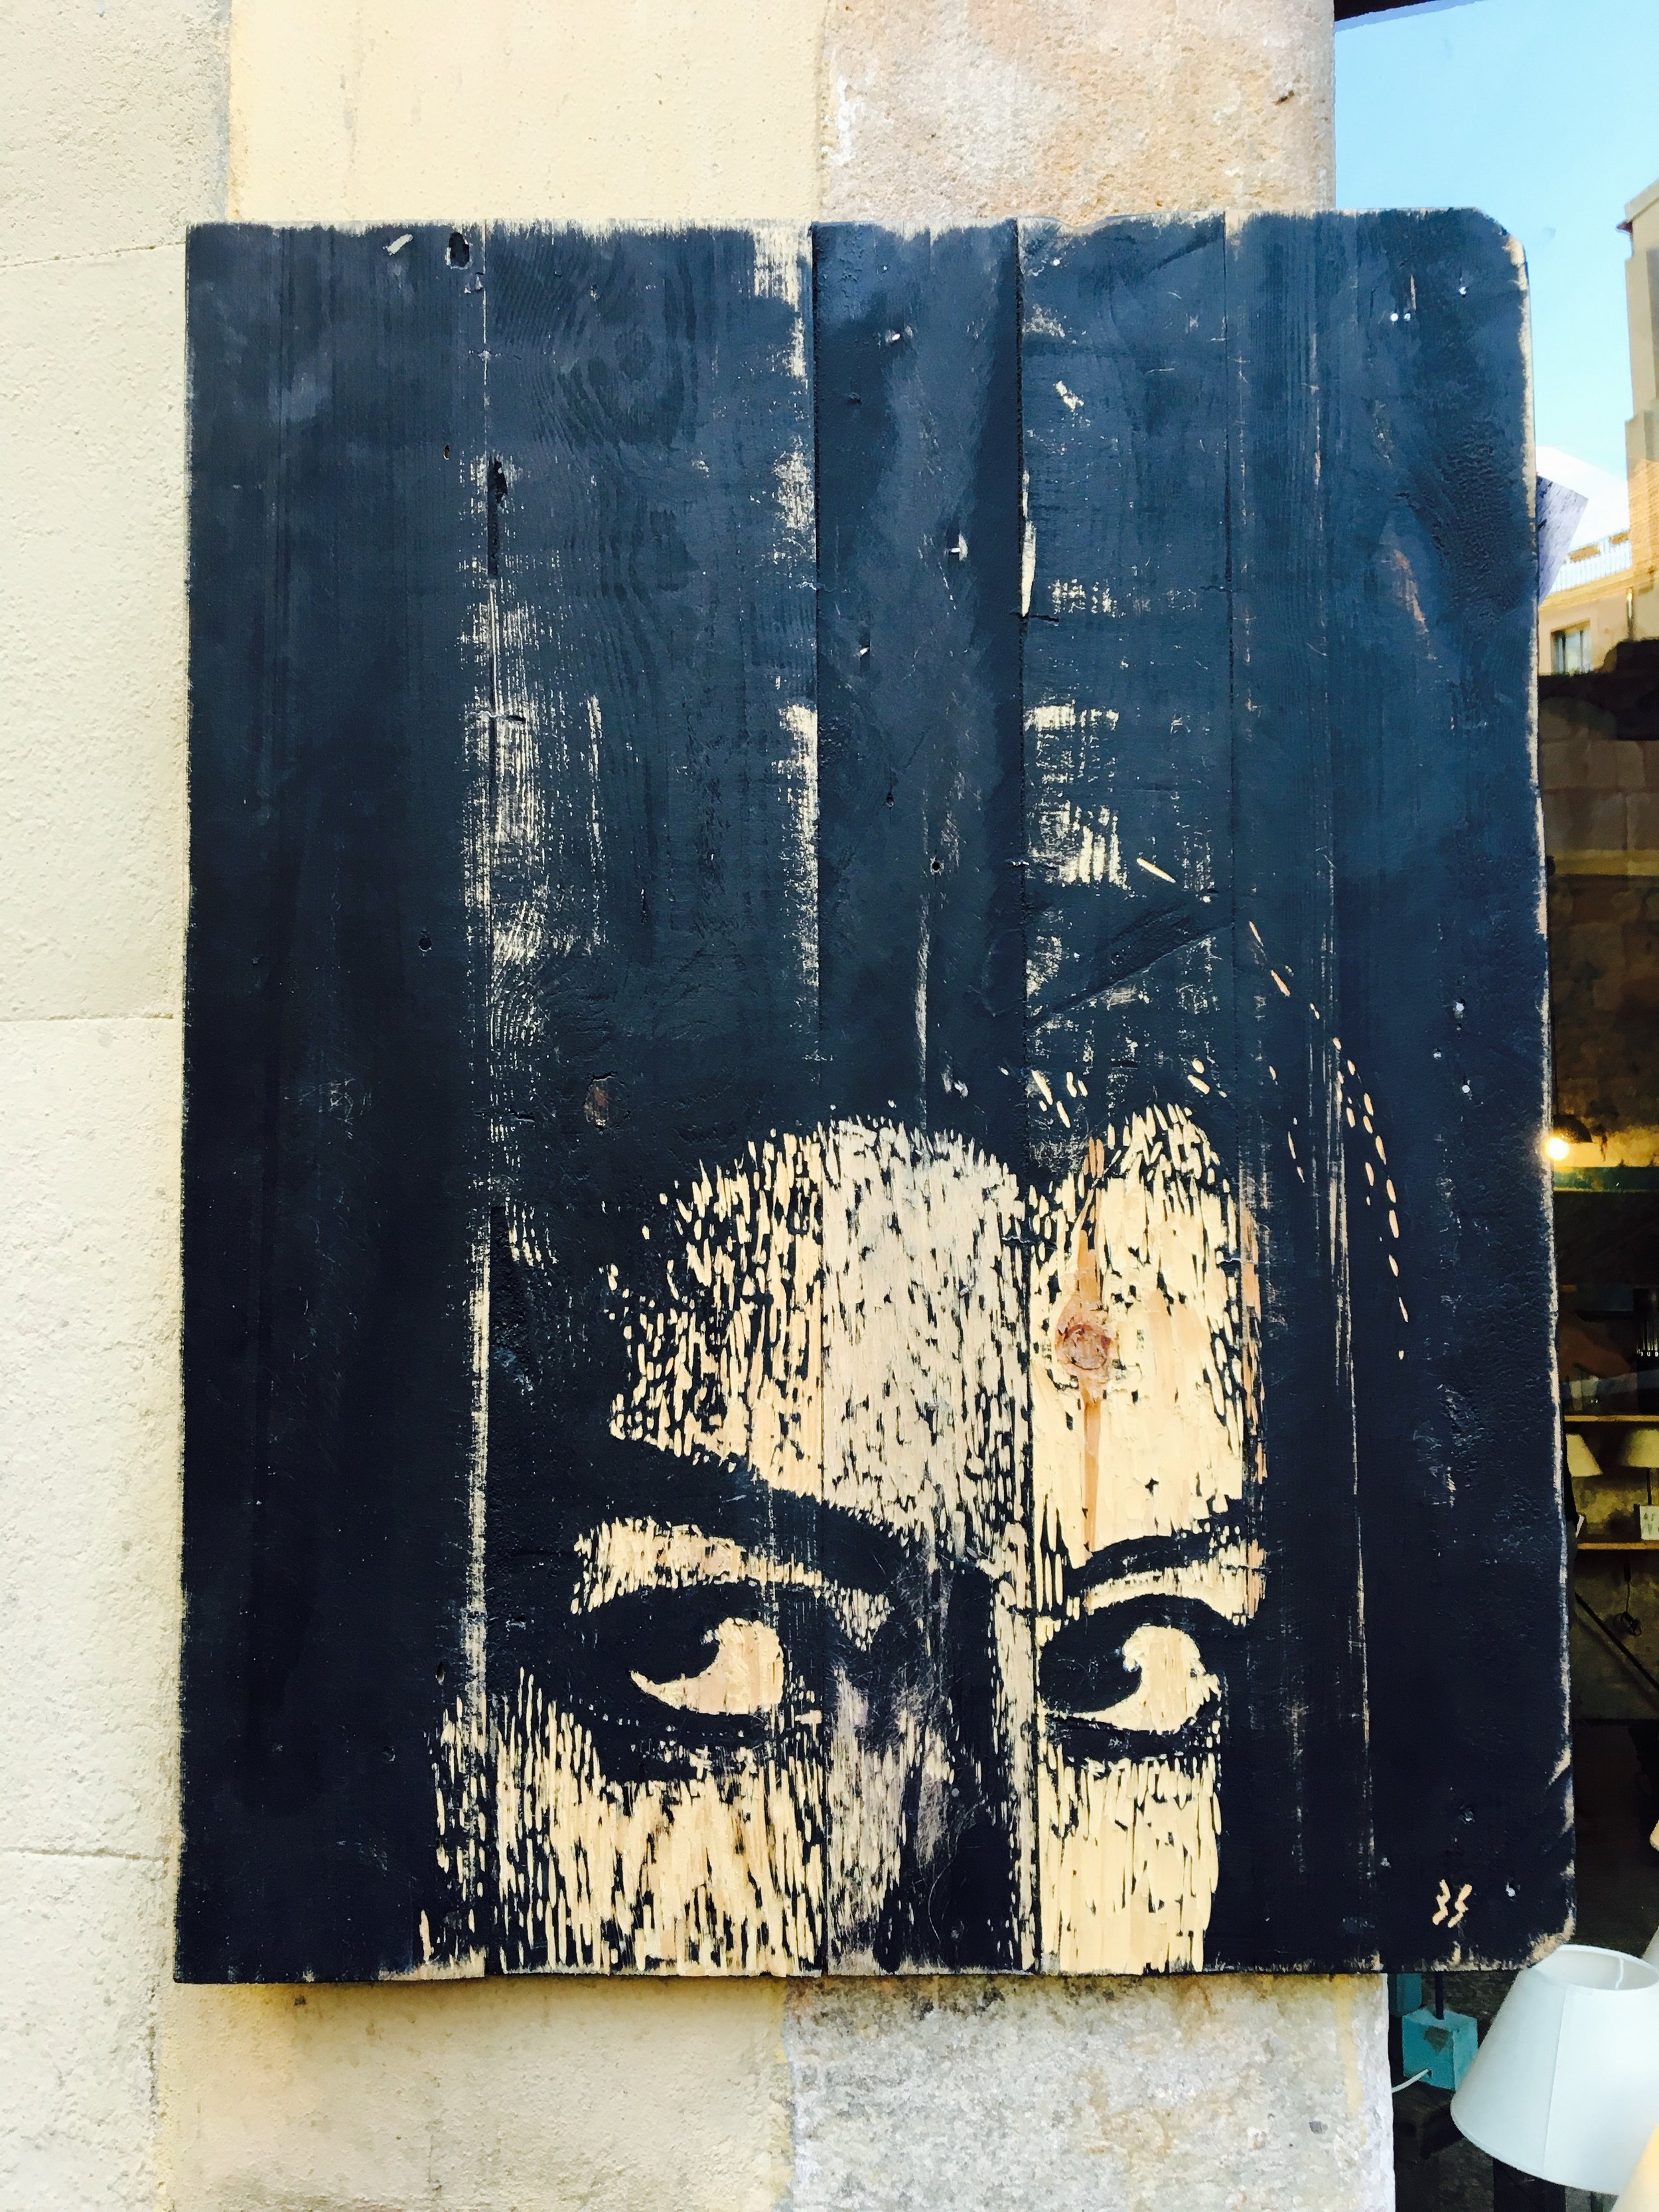 Wall Art (that happens to look a lot like me). - Barcelona, Spain (2016).